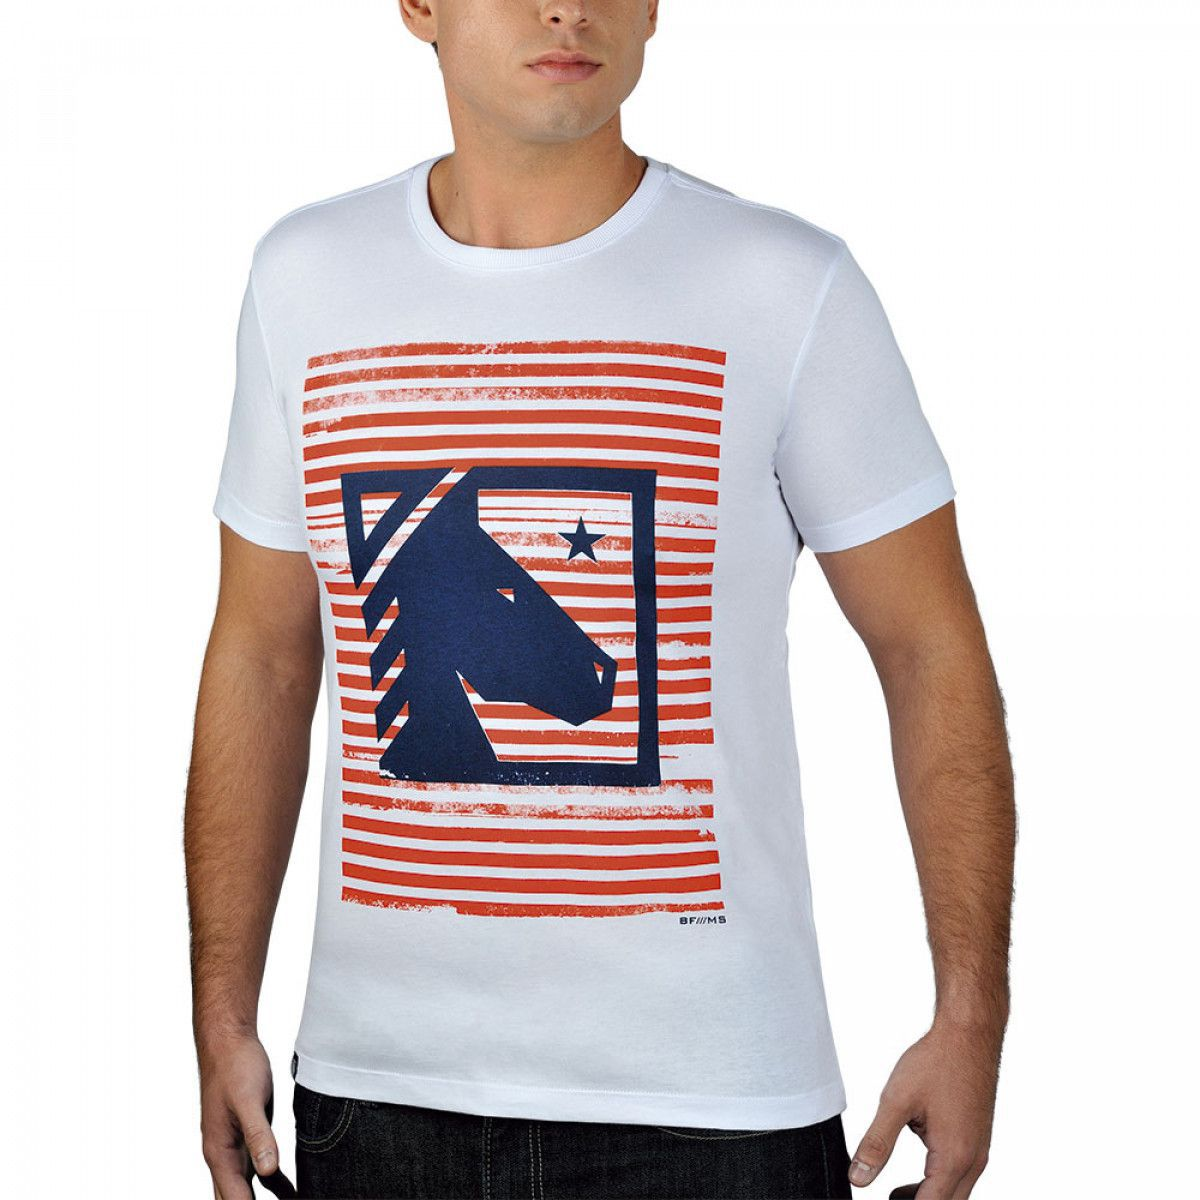 Camiseta Masculina BF///MS Horse Branca 184